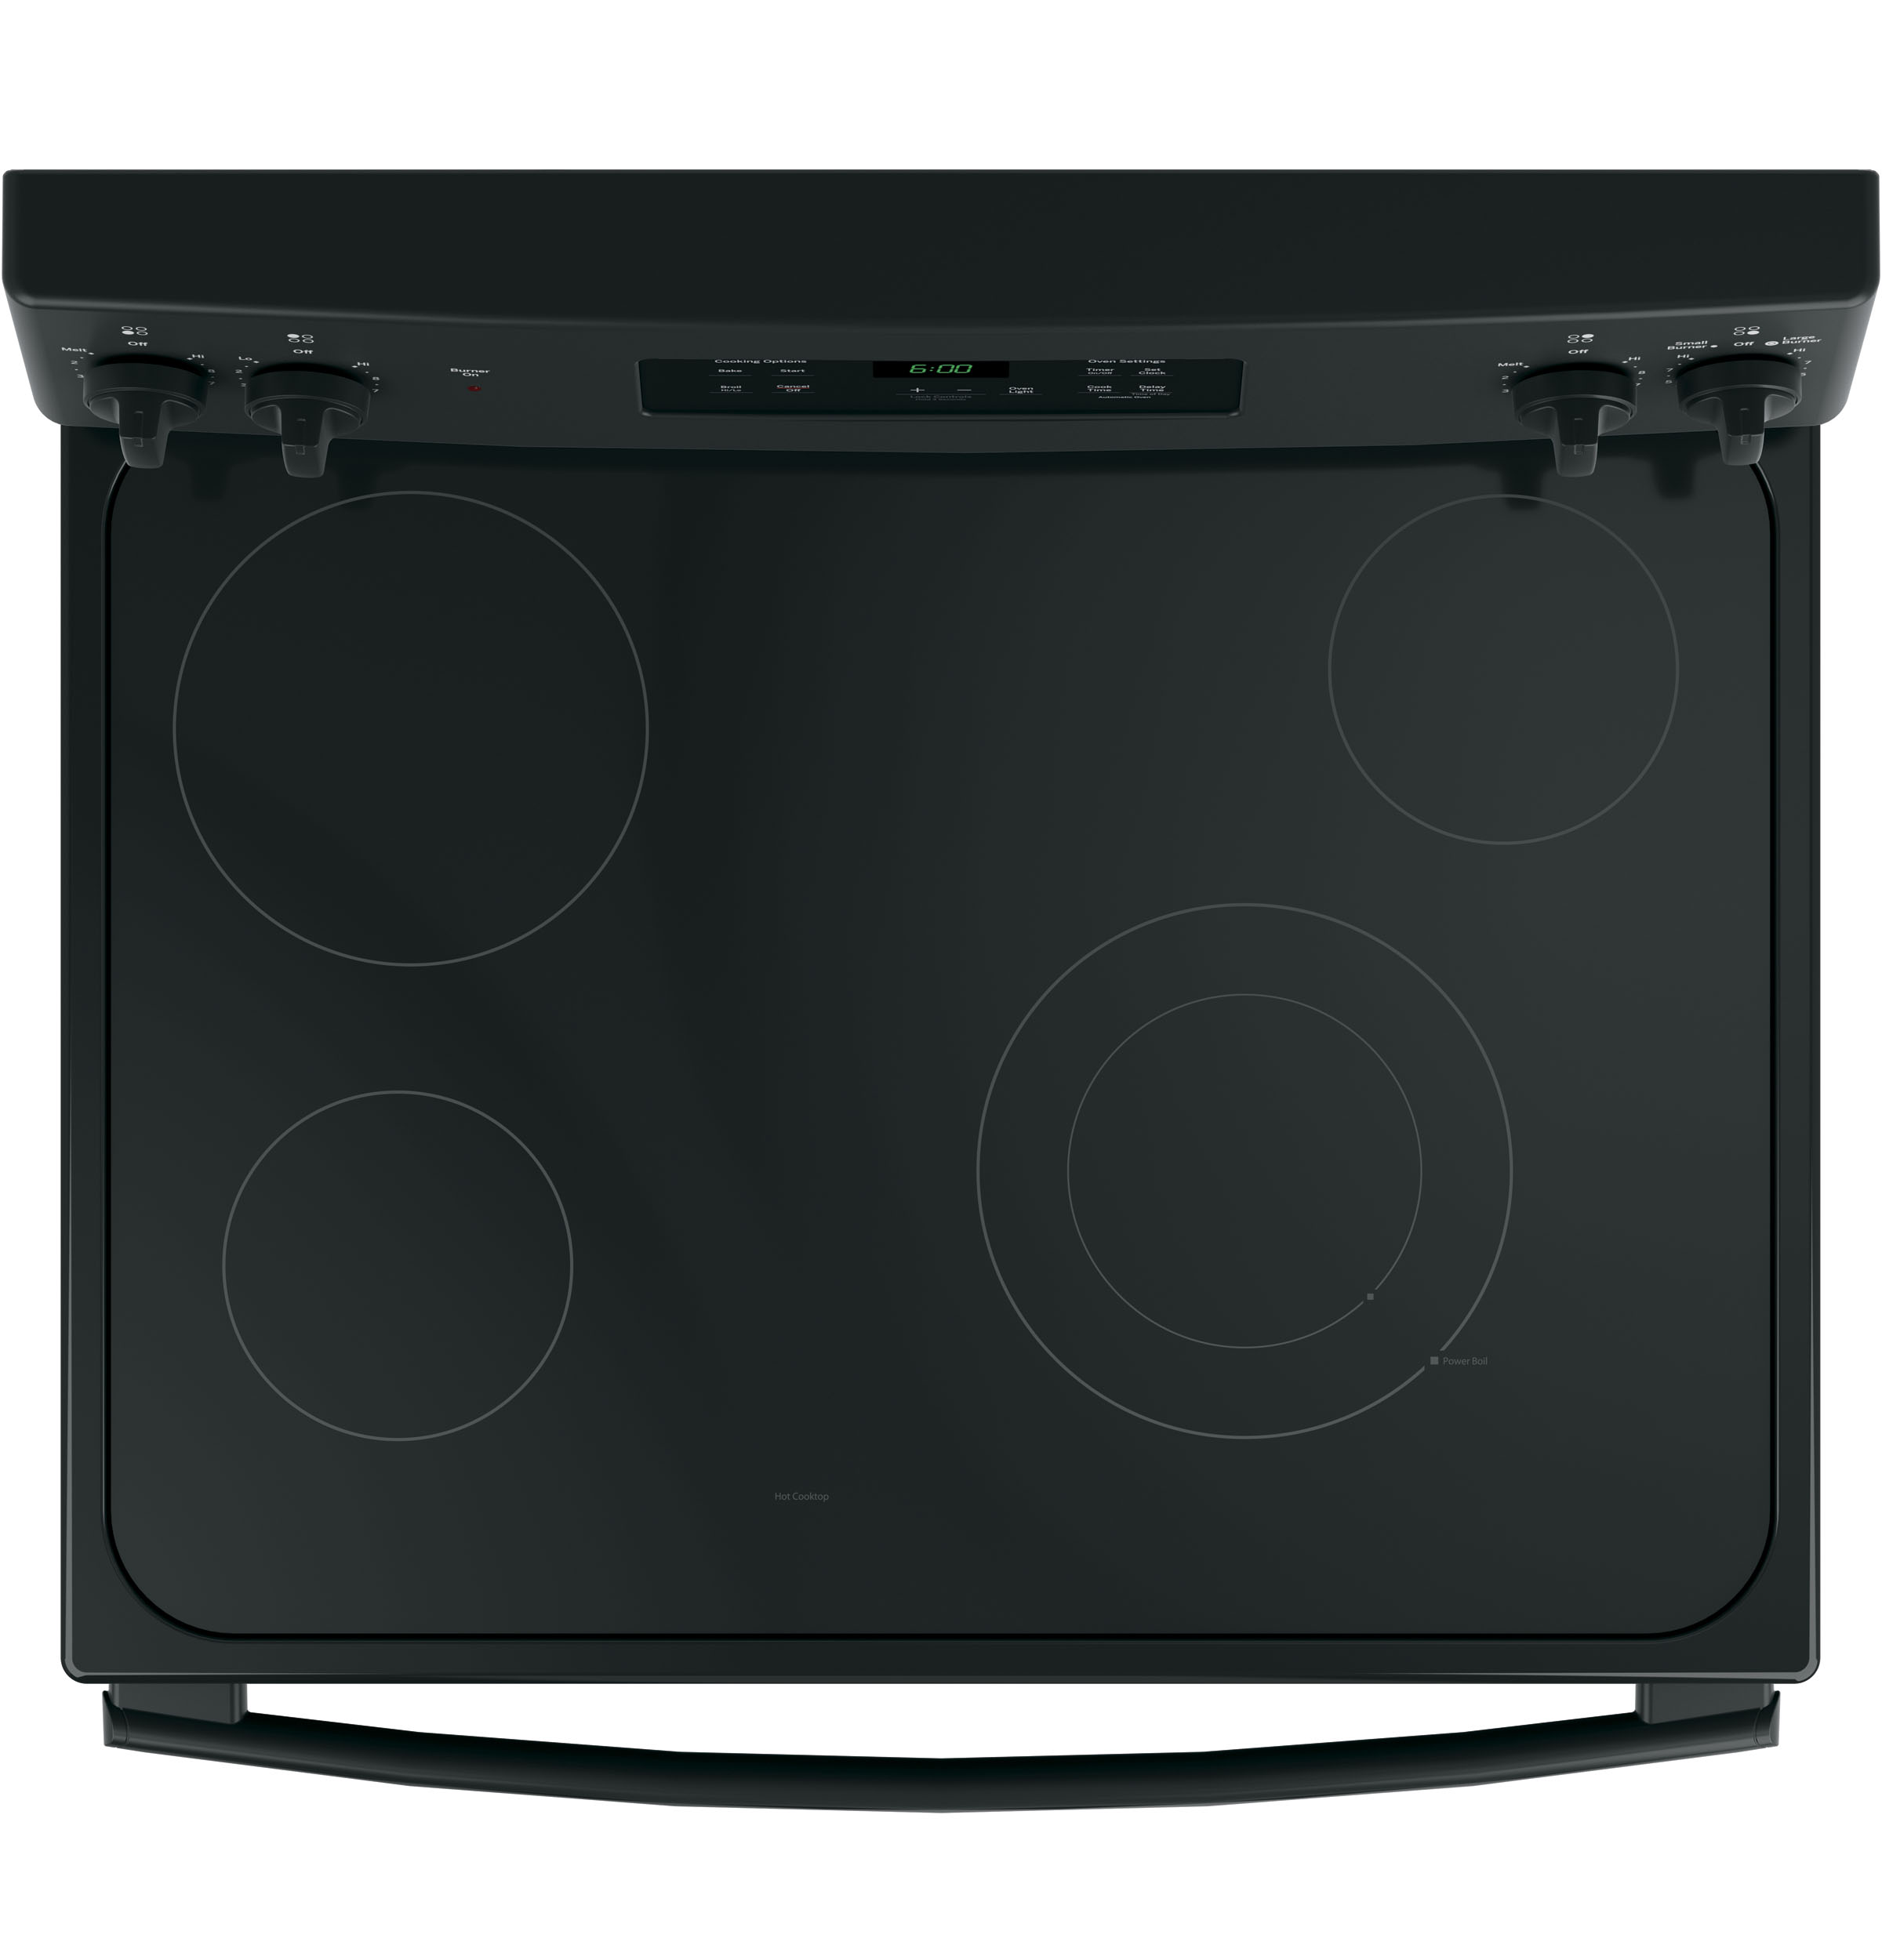 "Model: JBS60DKBB   GE GE® 30"" Free-Standing Electric Range"